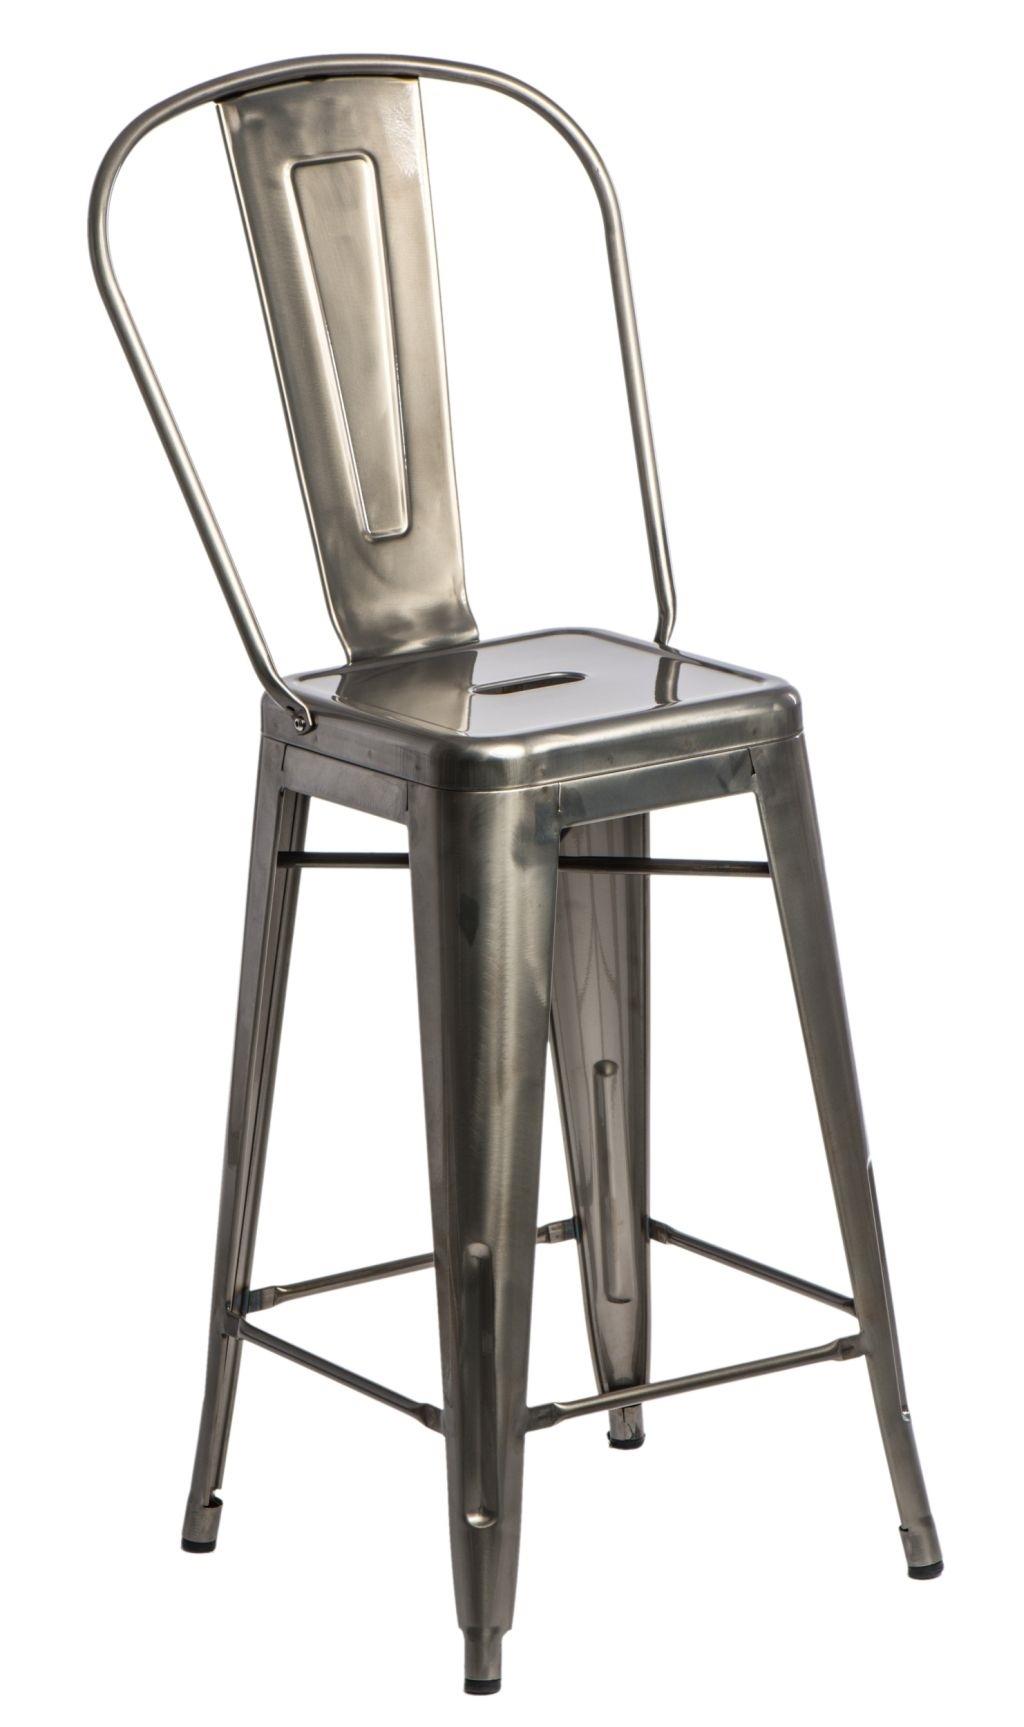 Barová židle s opěradlem  Paris Back metalická